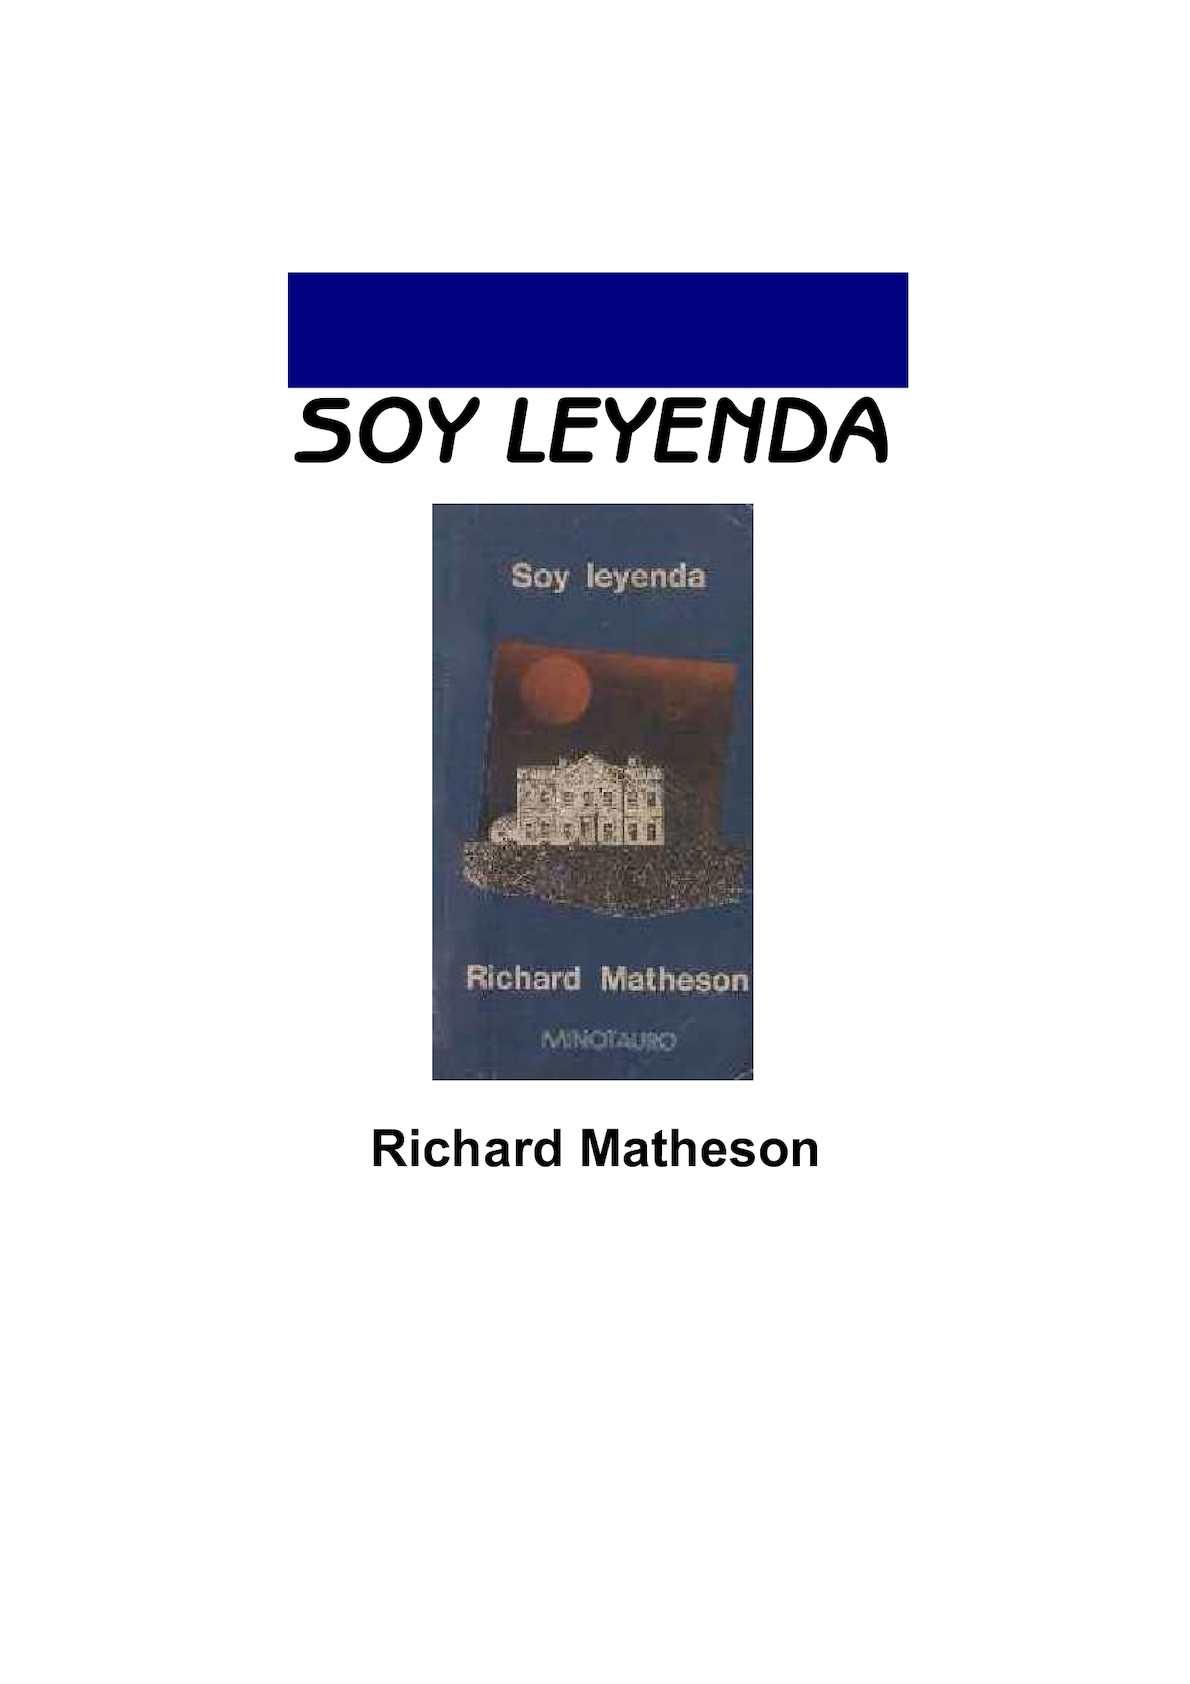 Calaméo - Soy Leyenda Richard Matheson